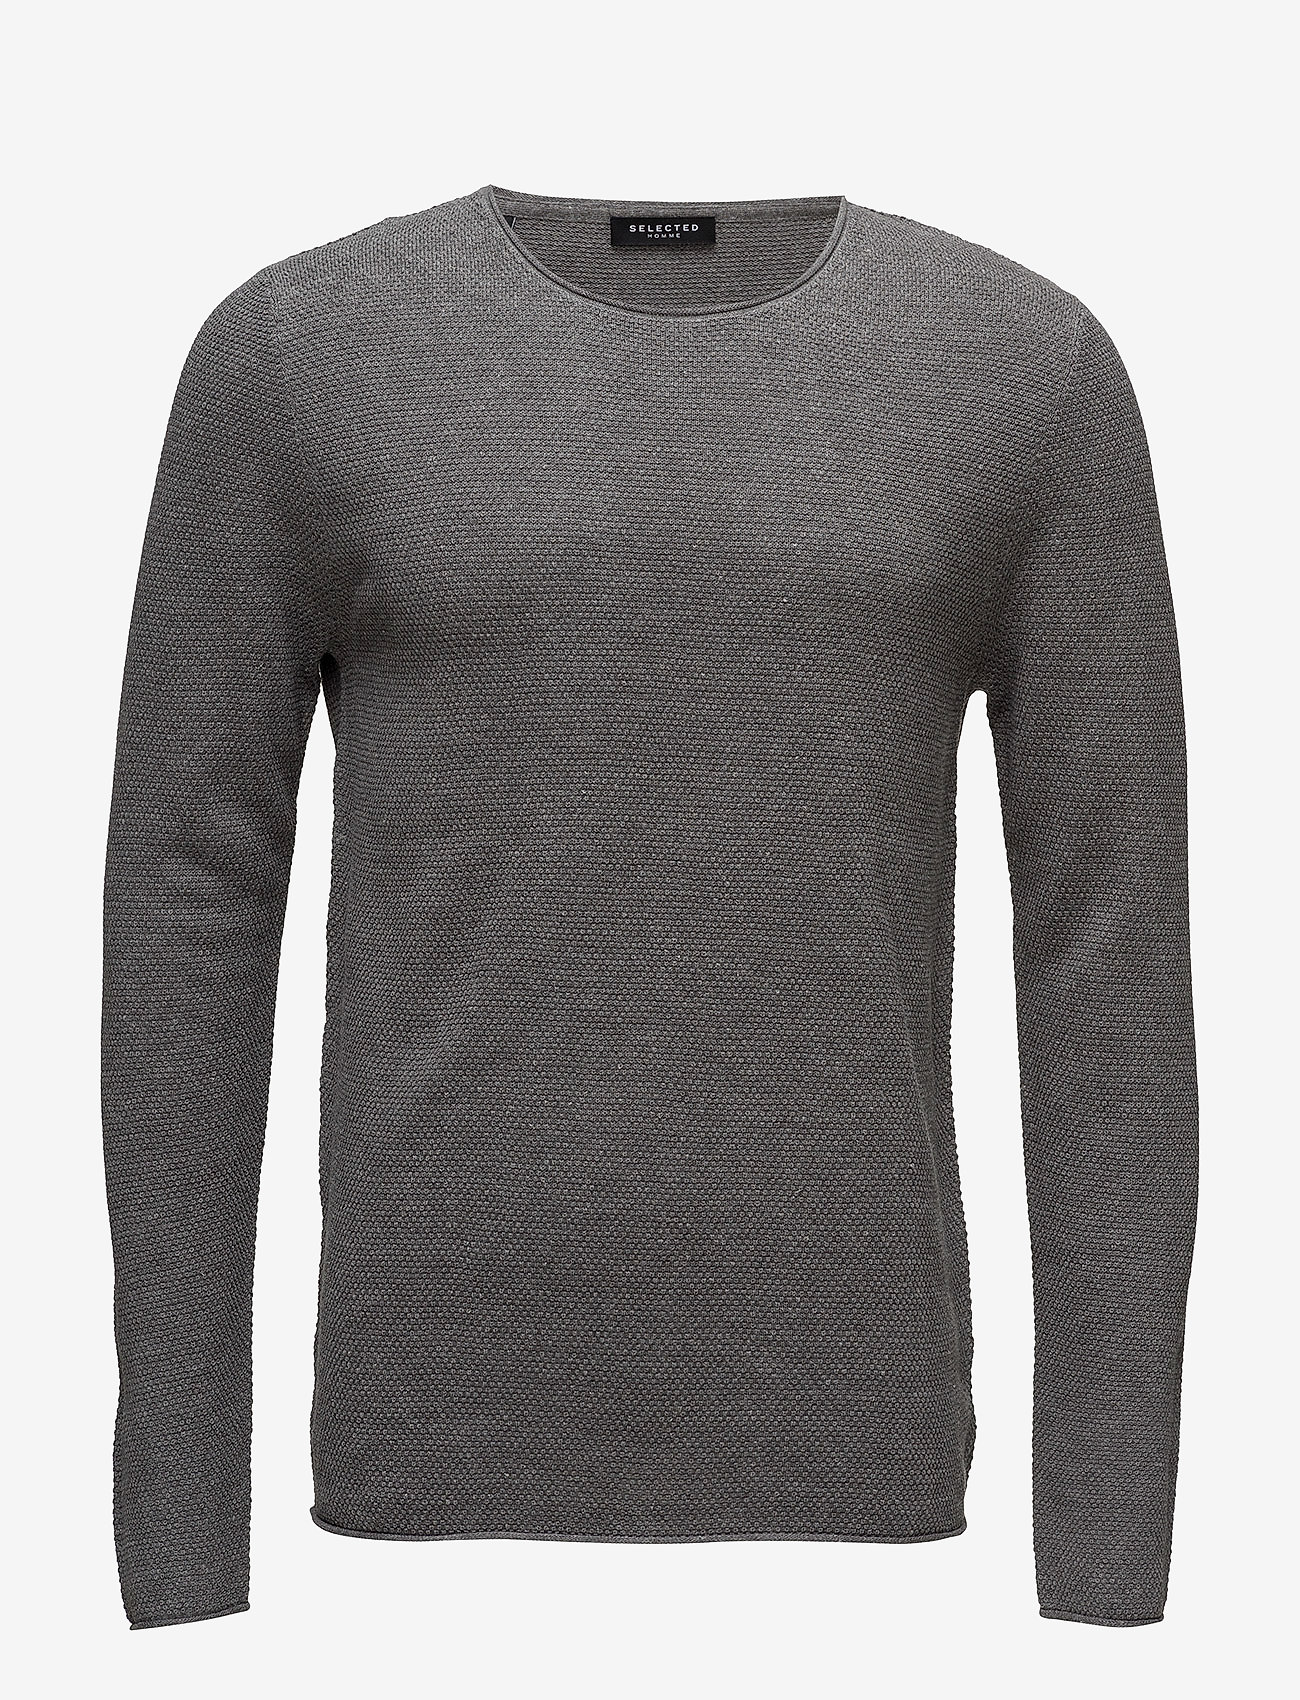 Selected Homme - SLHROCKY CREW NECK B NOOS - basic strik - medium grey melange - 0